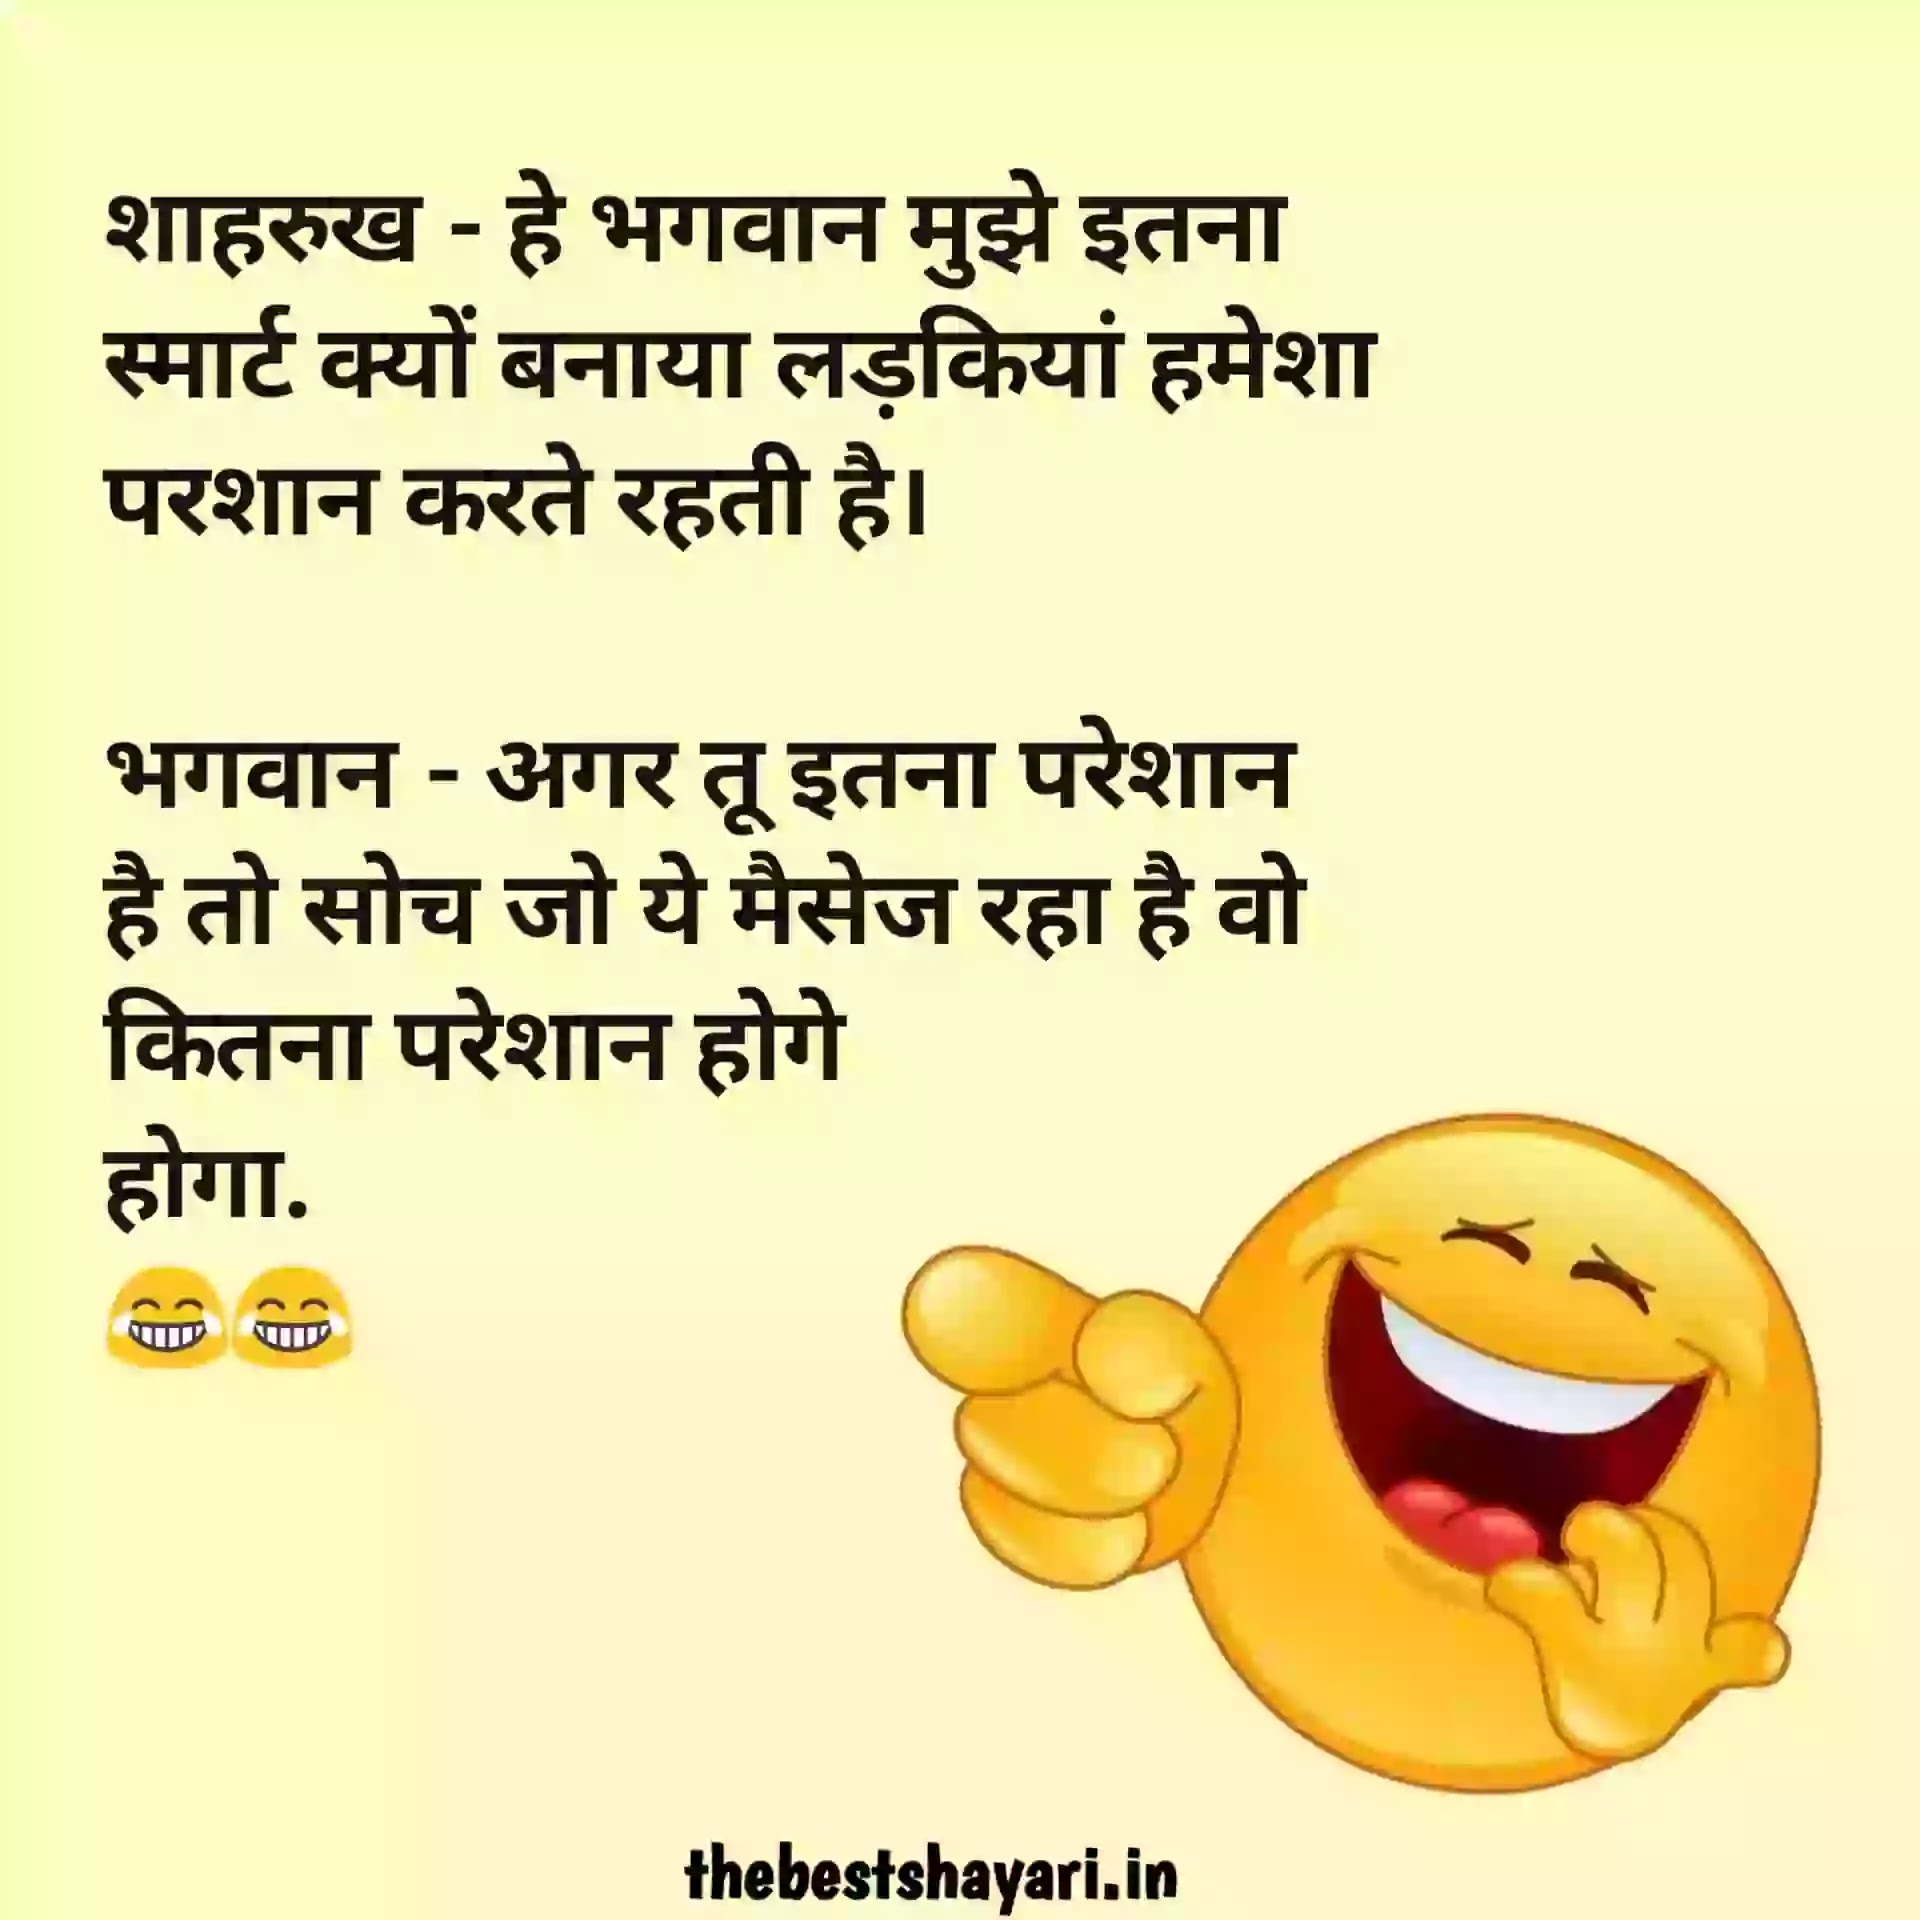 Hindi funny jokes latest